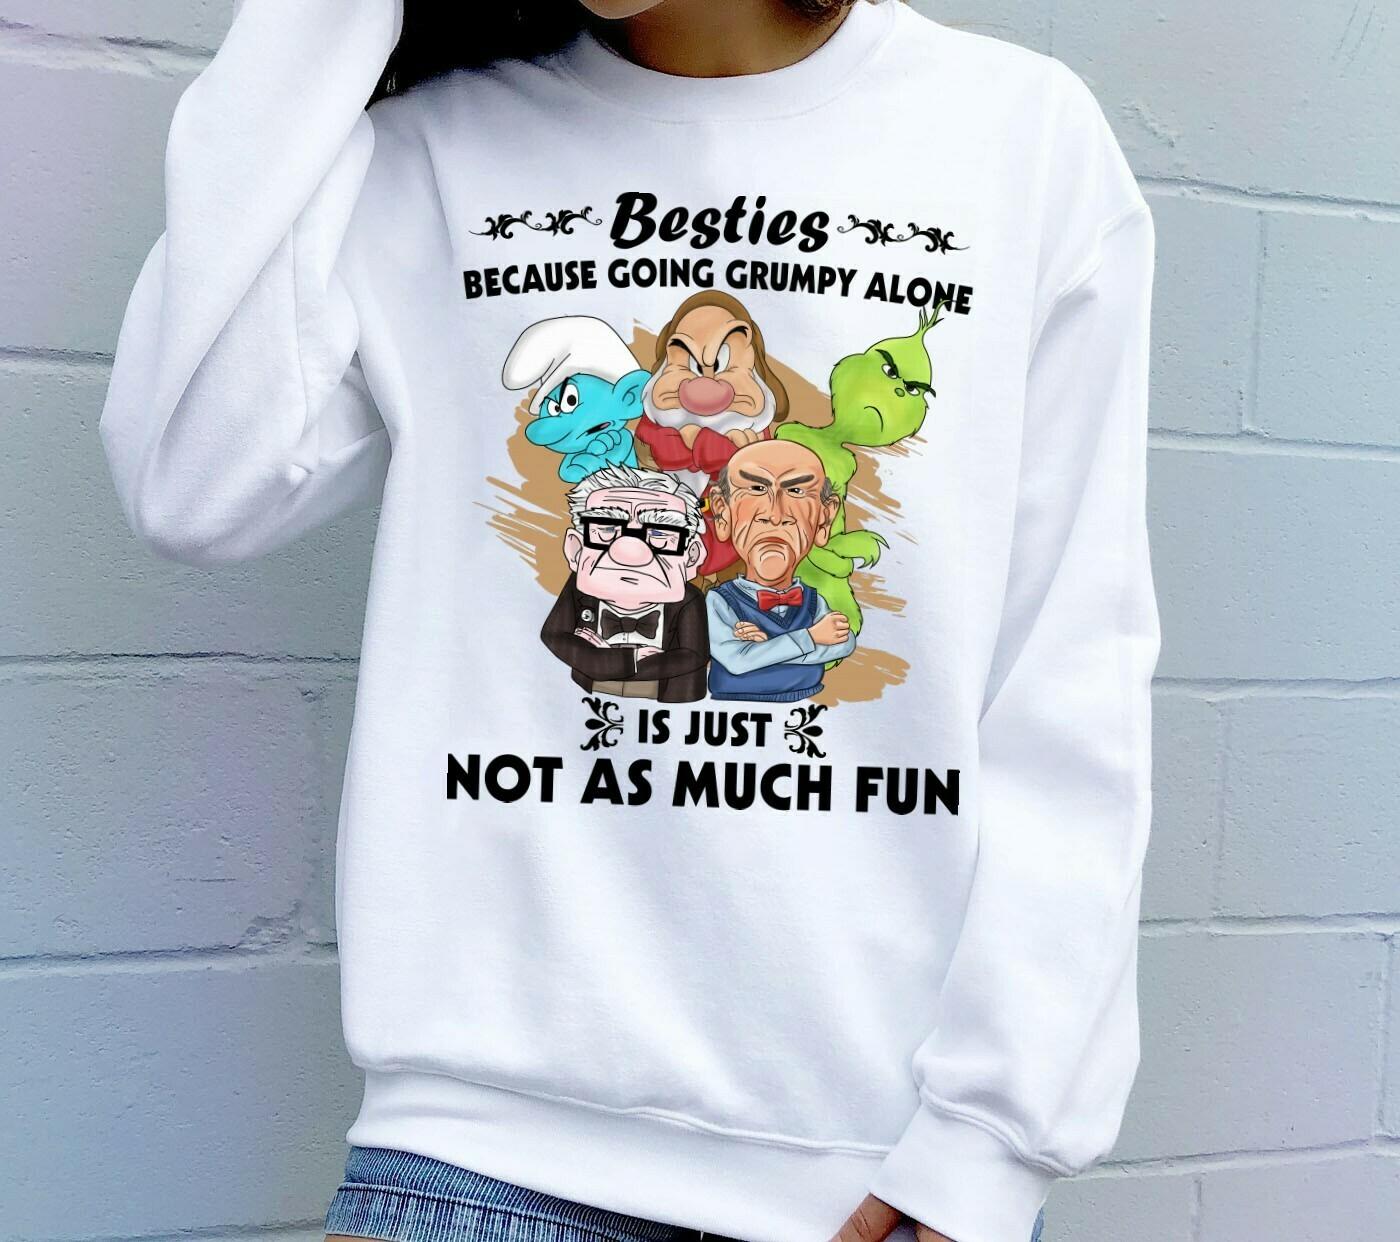 Grumpy Friends Besties Because Going Grumpy Alone T-shirt,Walt Disney World,Grumpy Seven Dwarfs Shirt,Grumpy Friends TShirt,Grumpy Old Man Long Sleeve Sweatshirt Hoodie Jolly Family Gifts